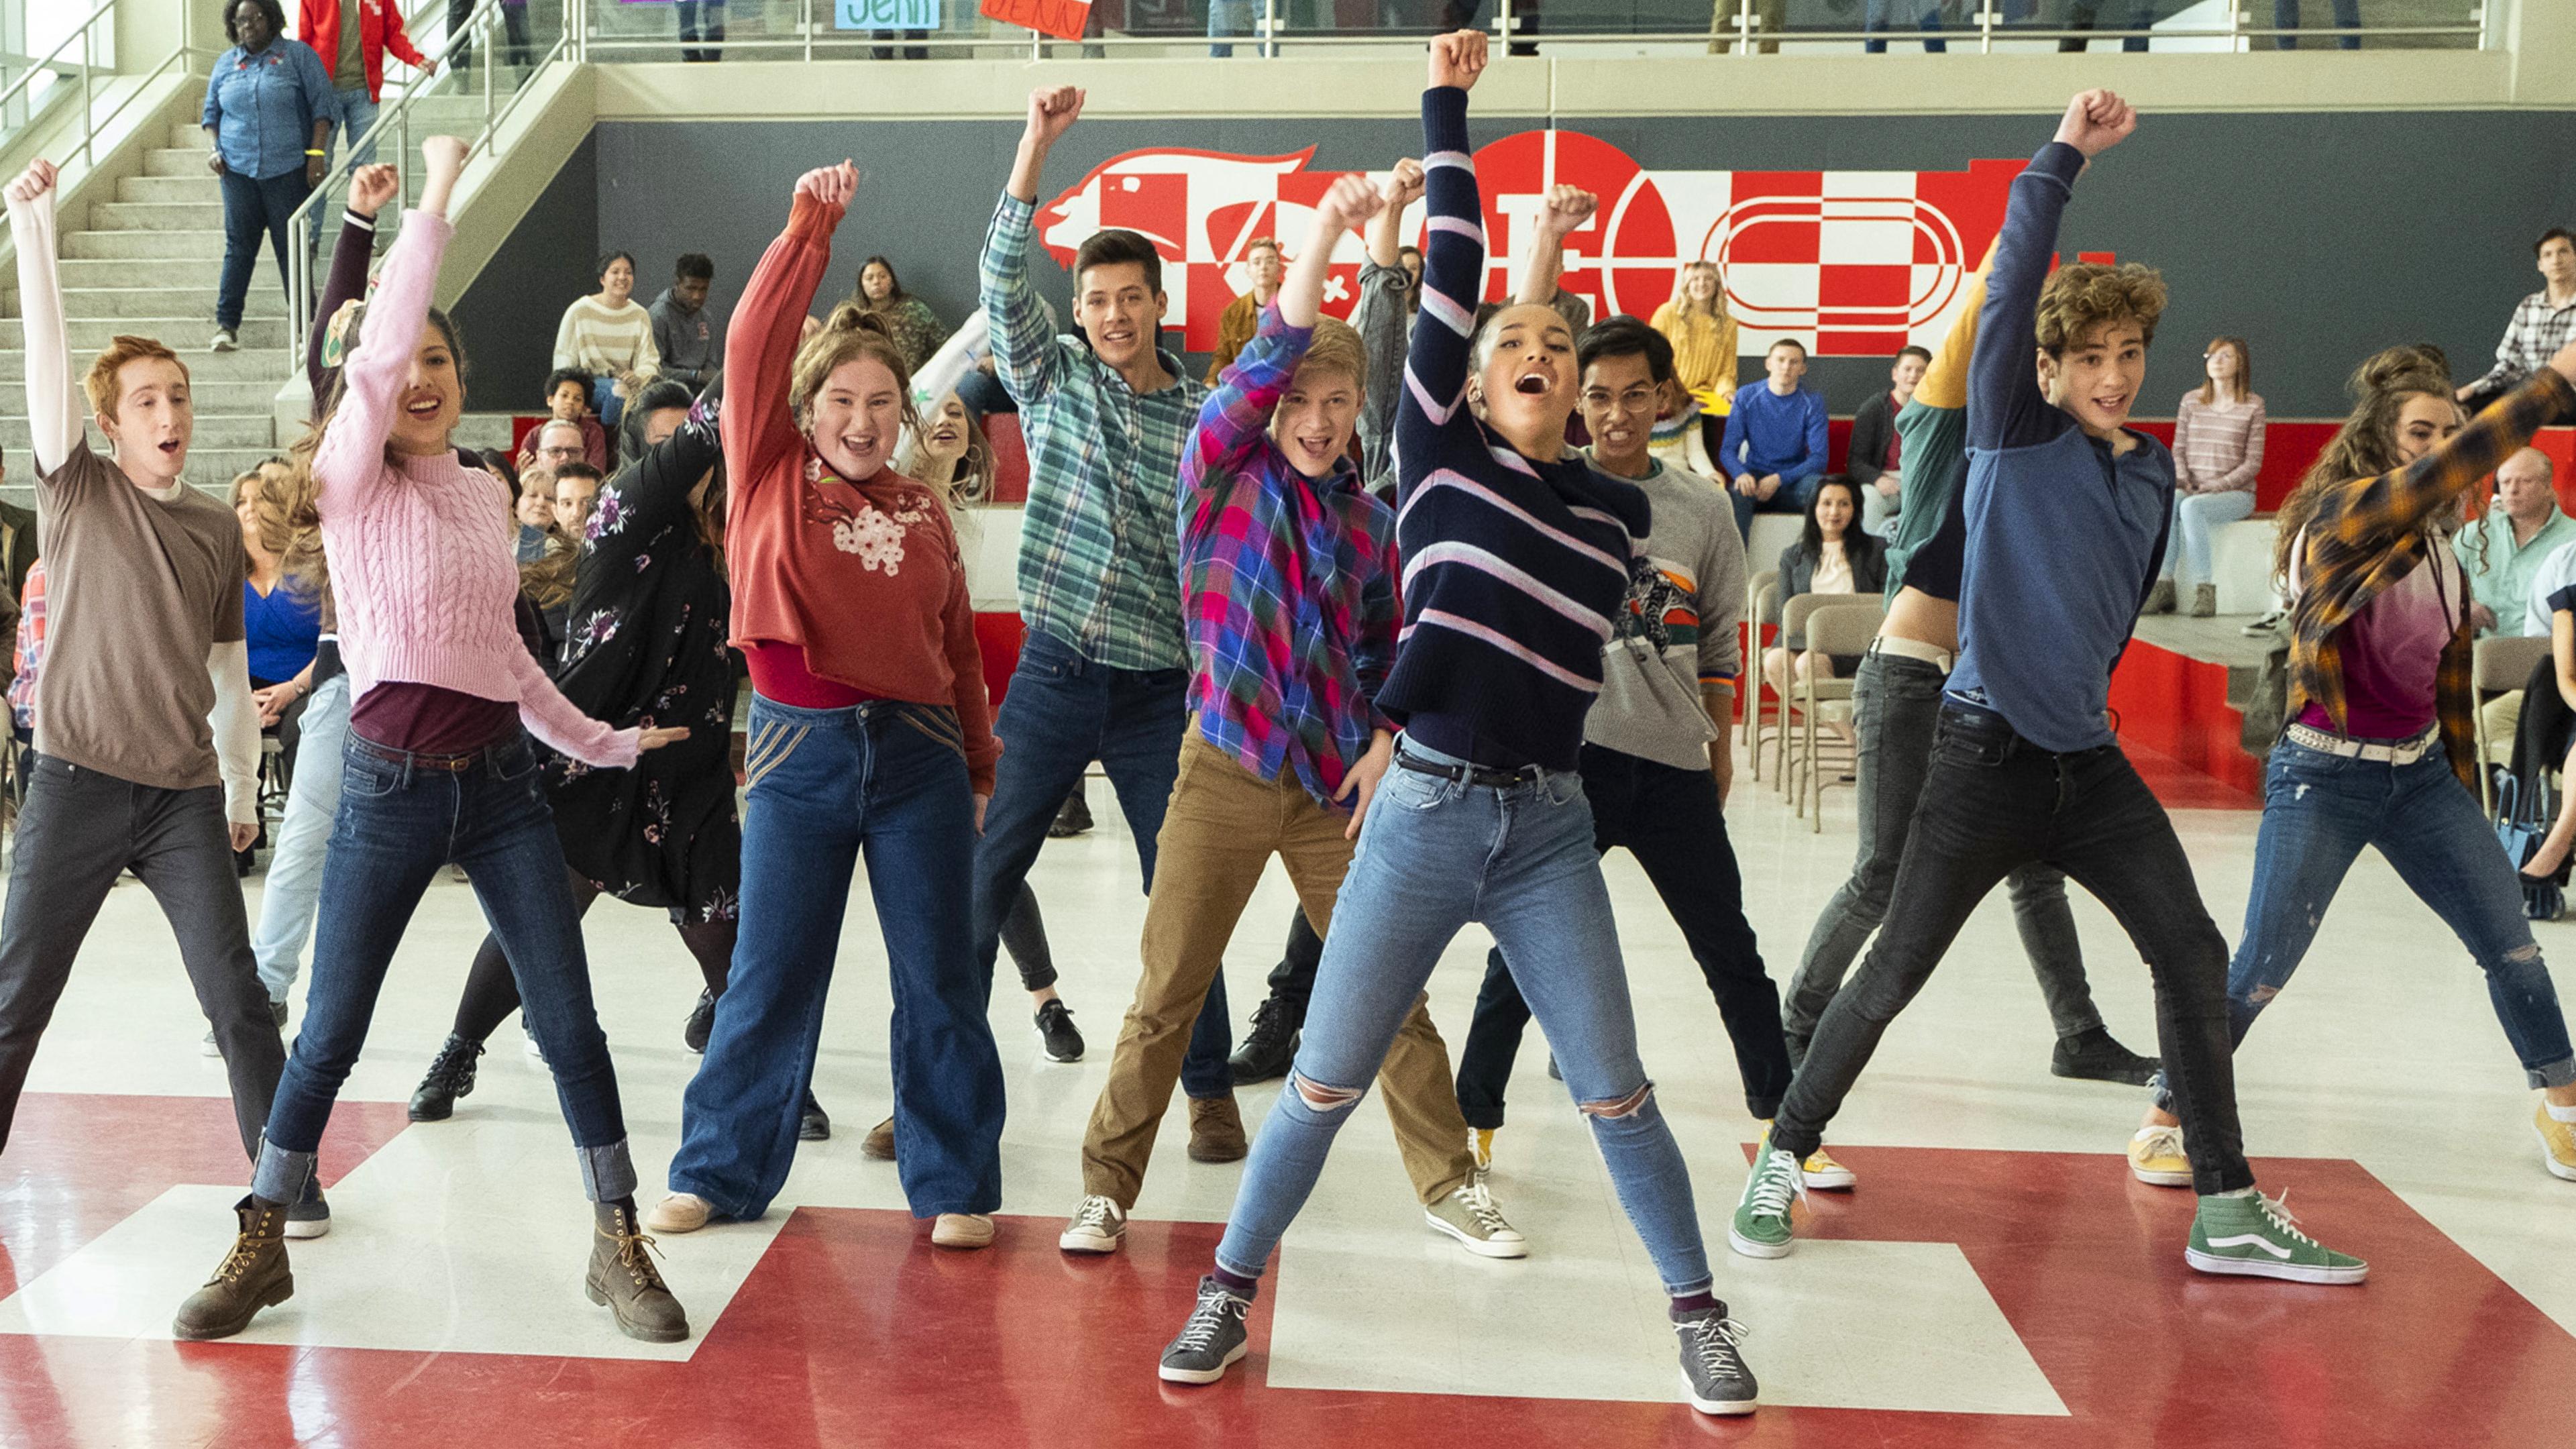 High School Musical: The Musical: The Series Season 1 Episode 6